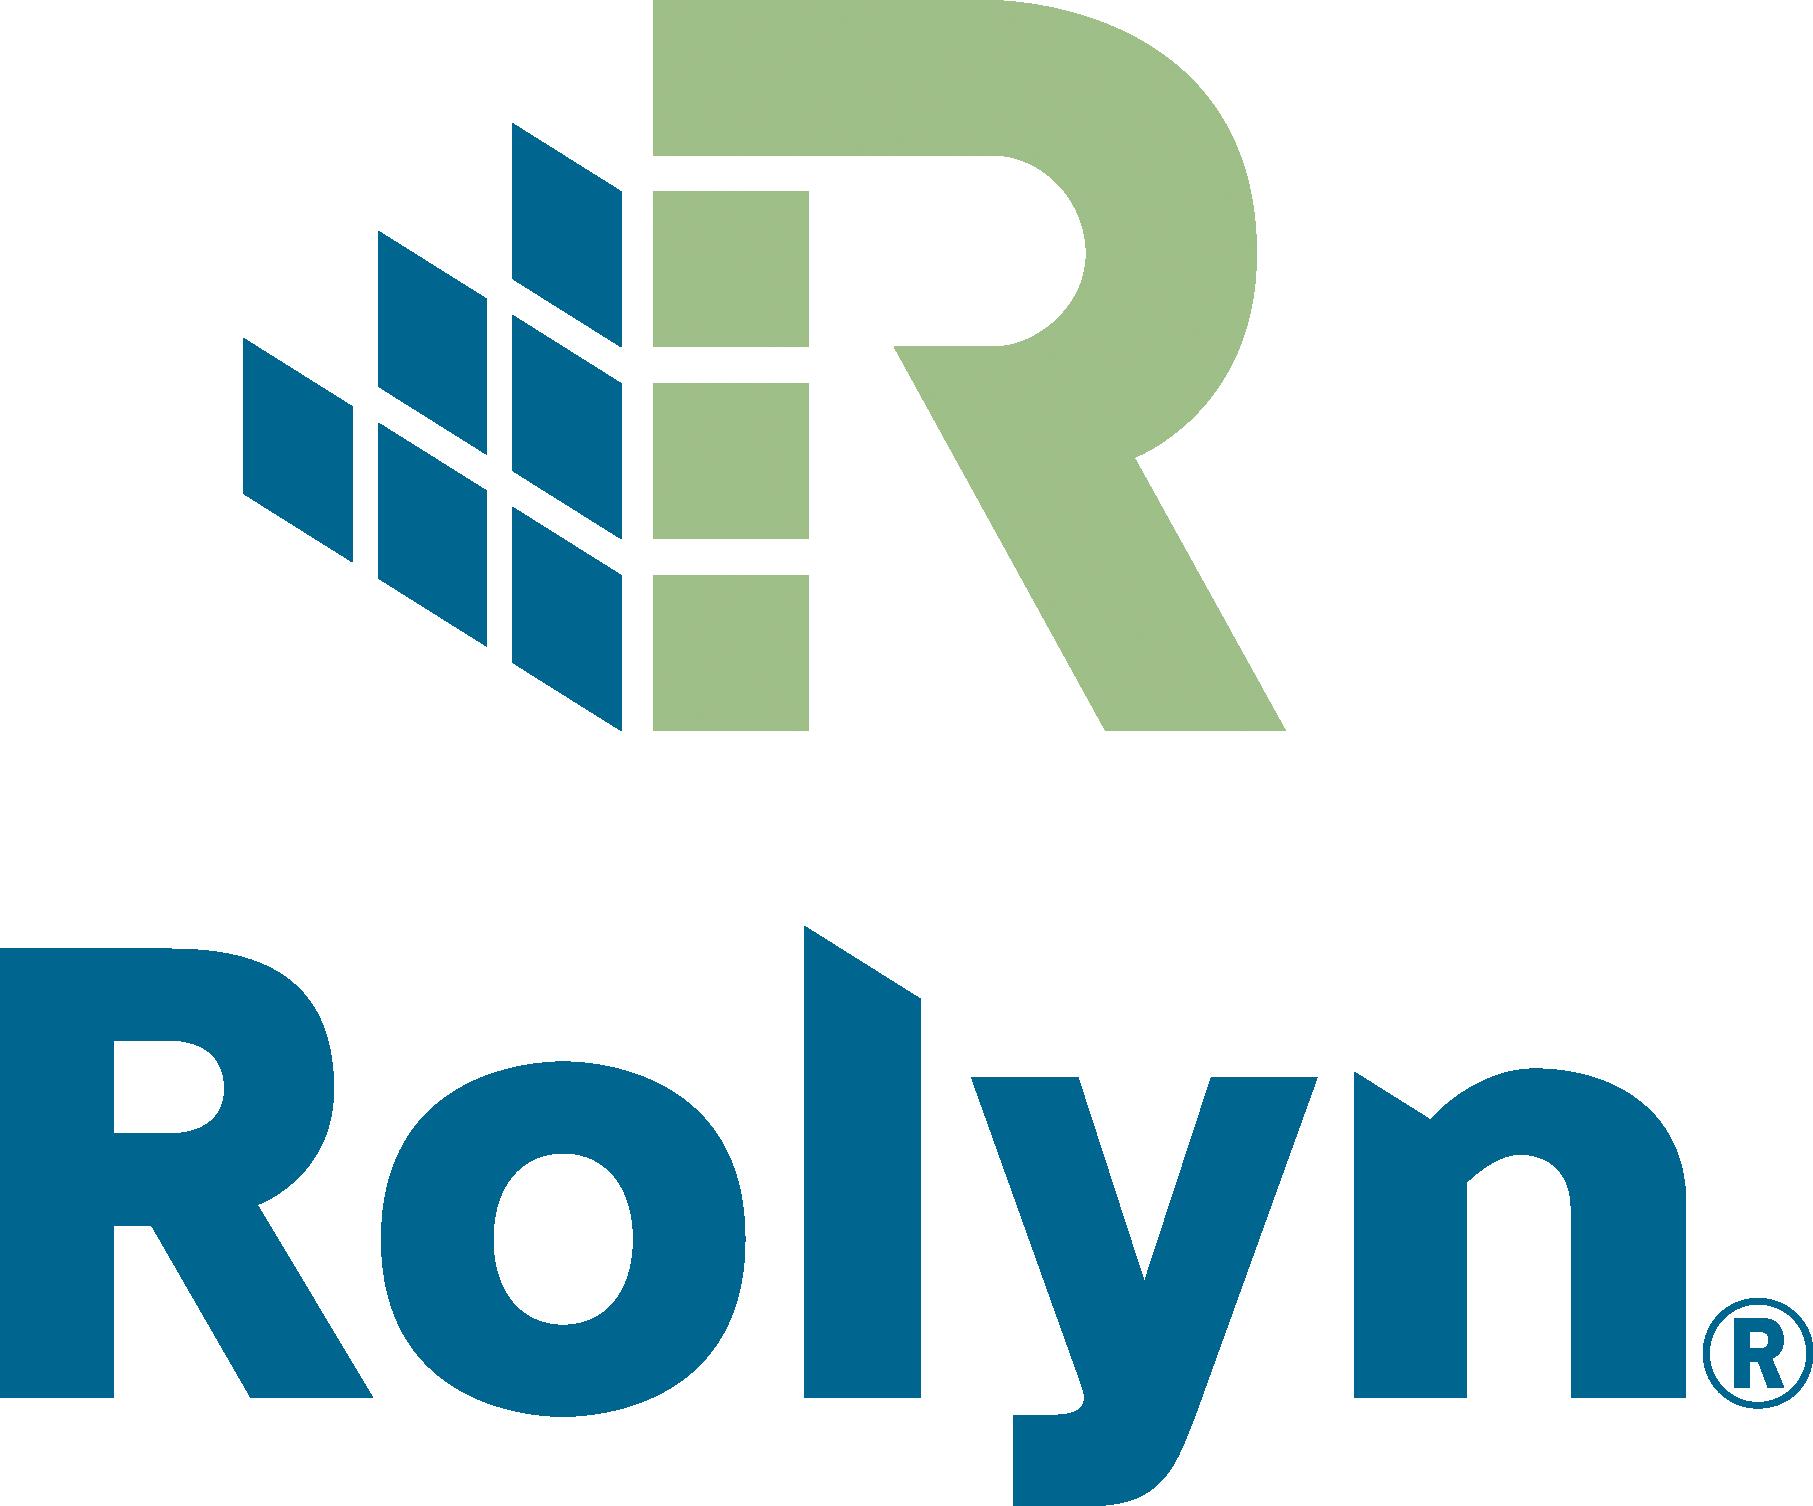 Rolyn Registered Logo